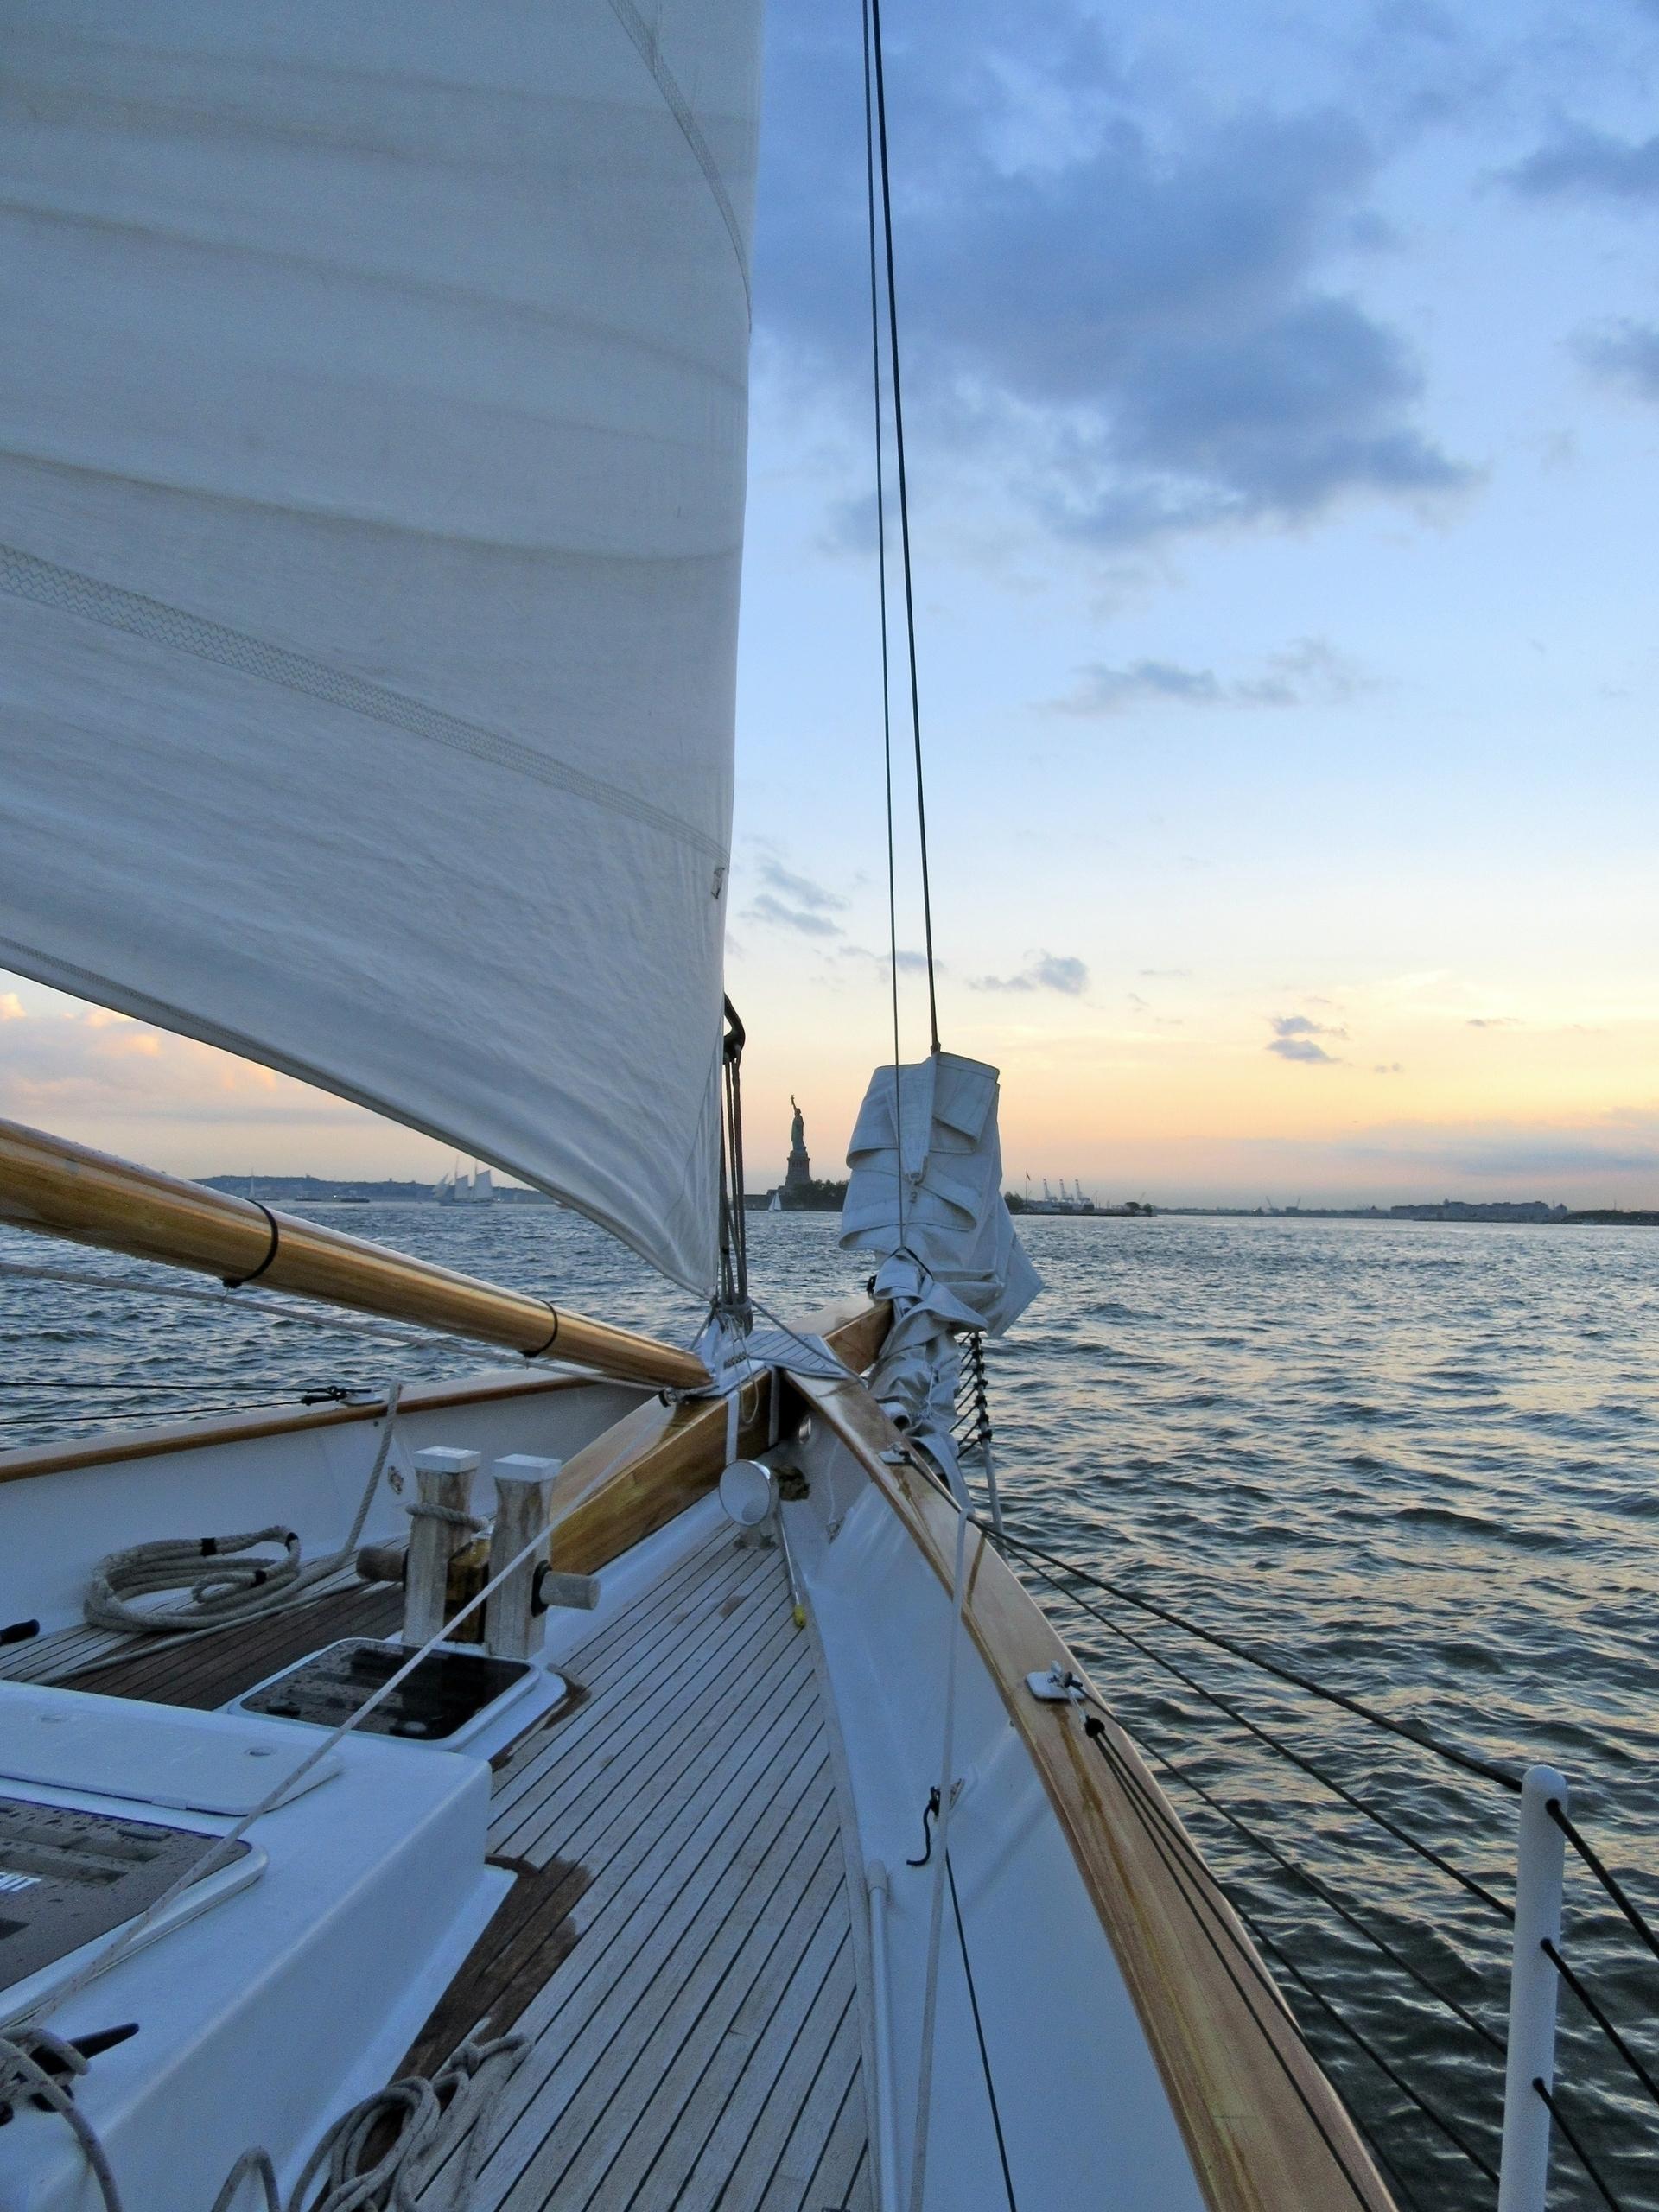 Sailing takes snap birthday wee - wavewhore | ello